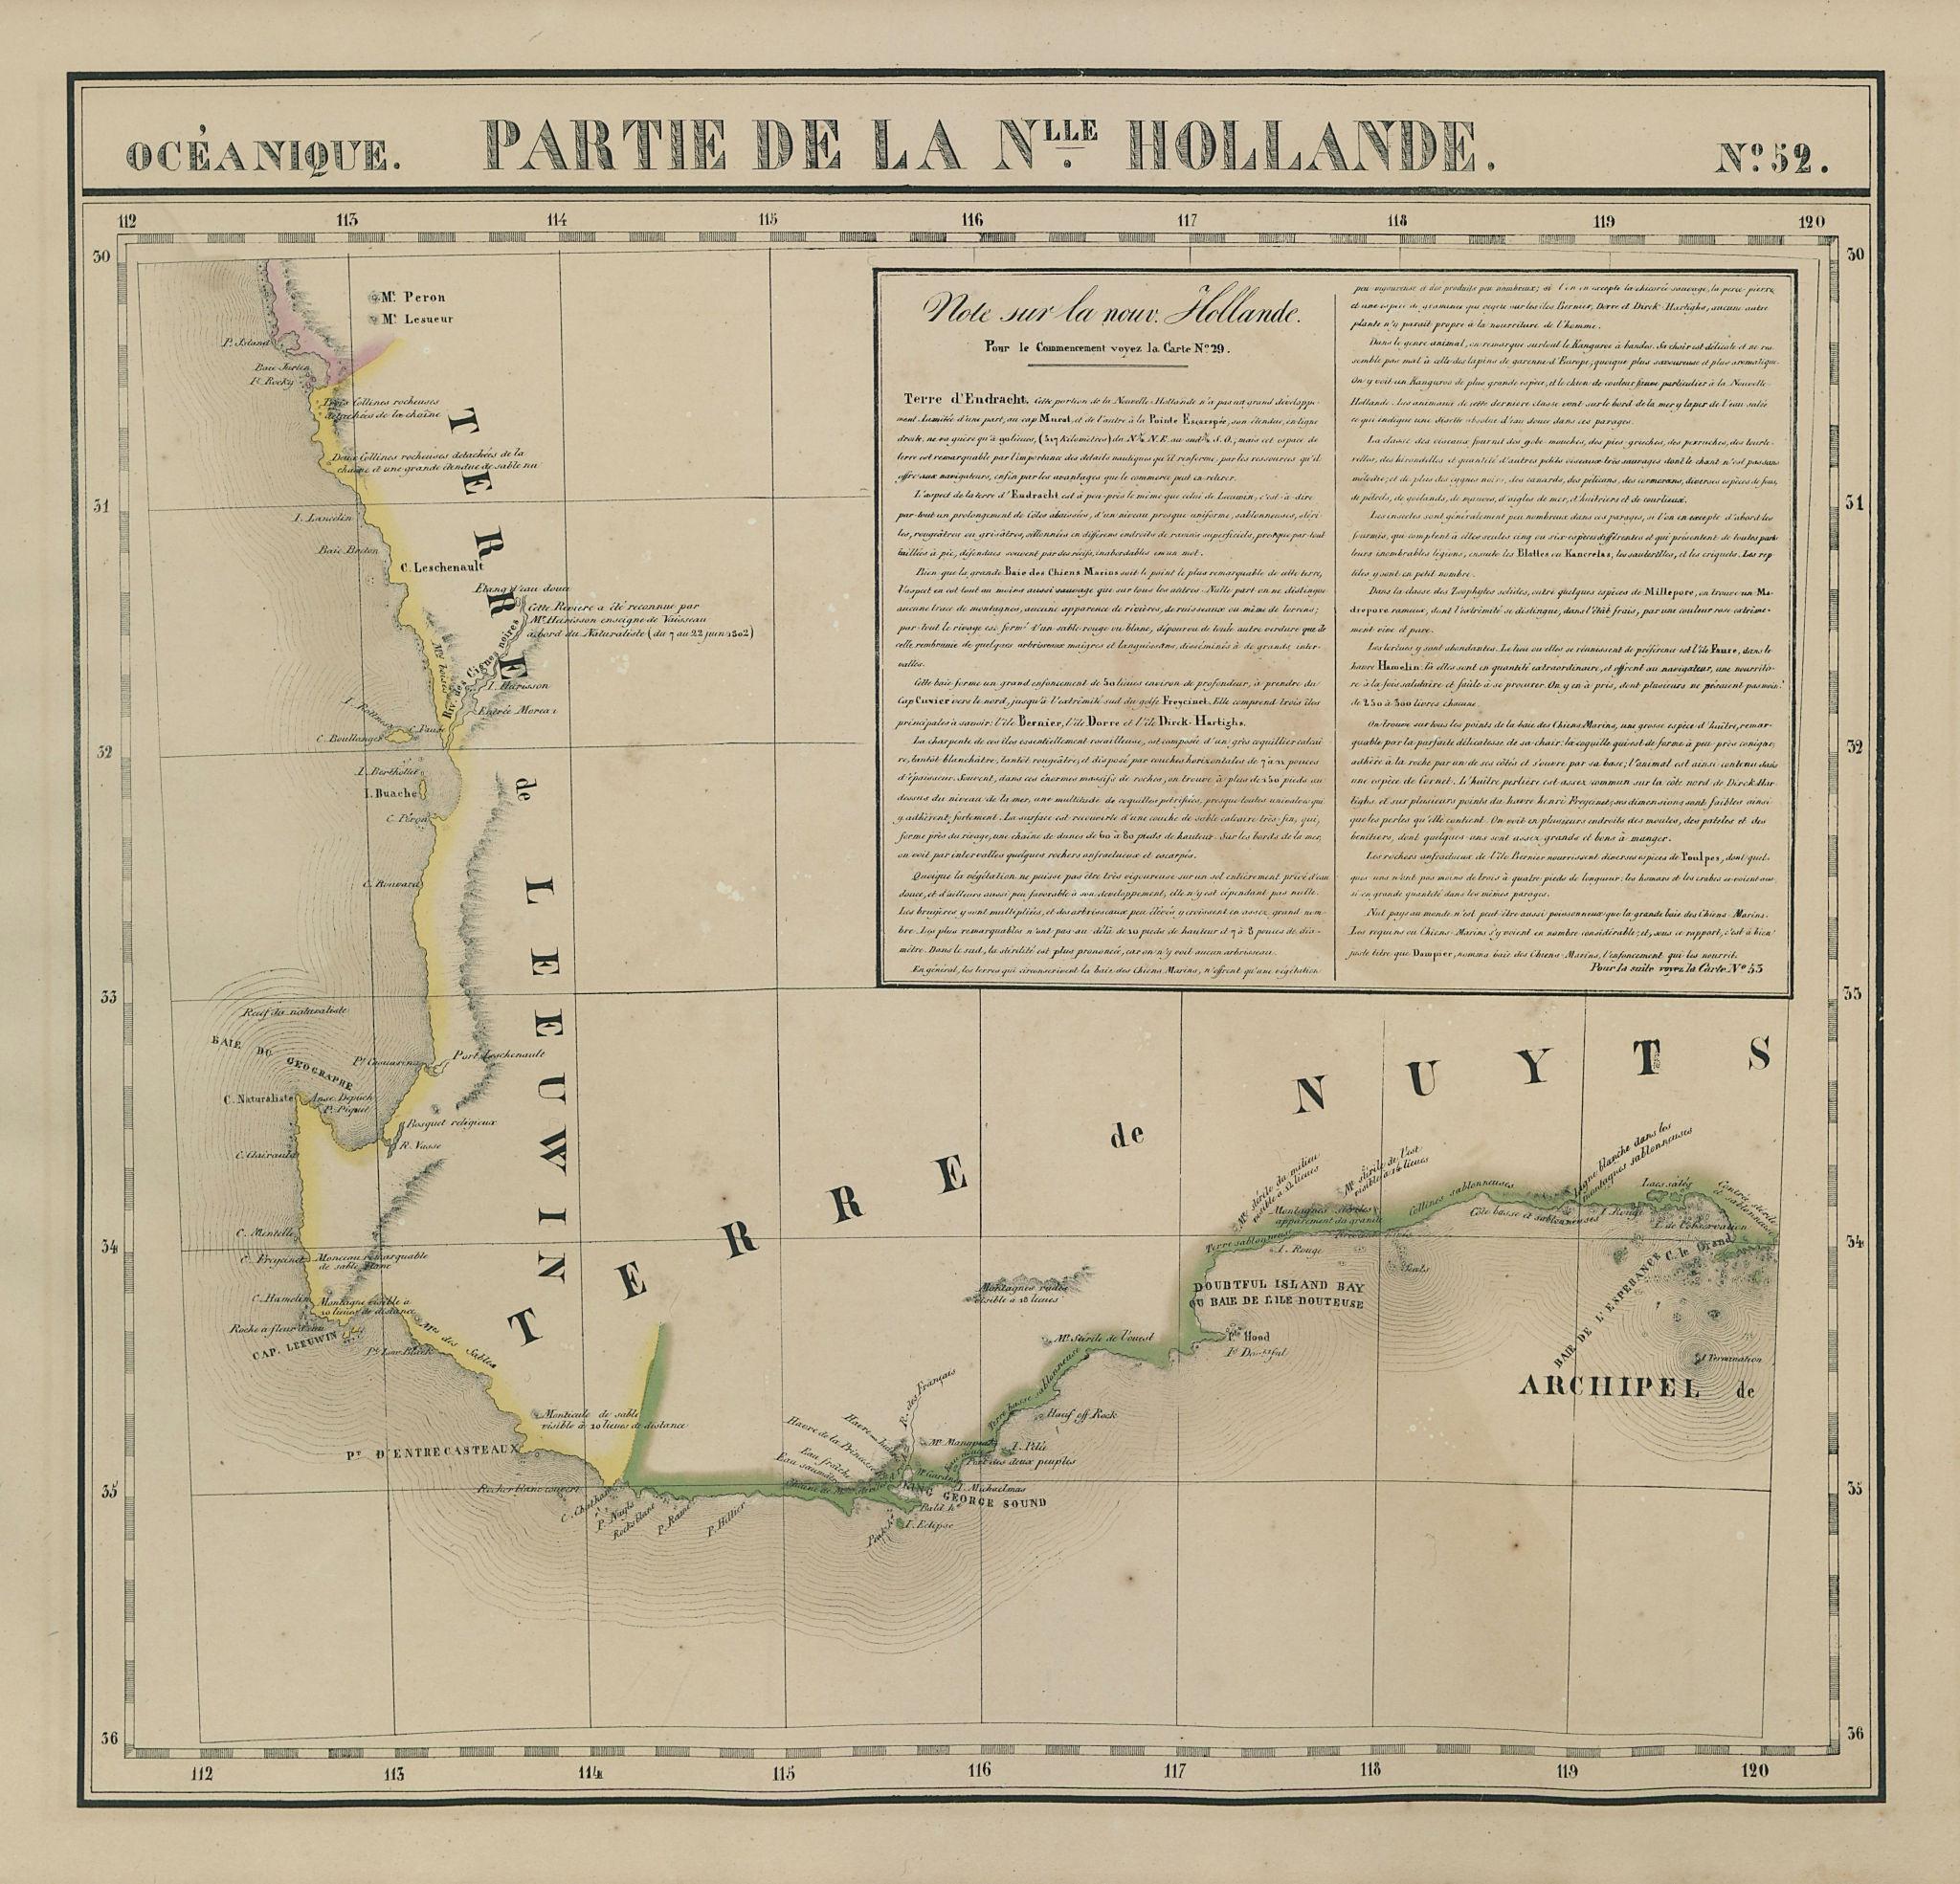 Océanique. Partie… Nle Hollande #52. Western Australia SW. VANDERMAELEN 1827 map